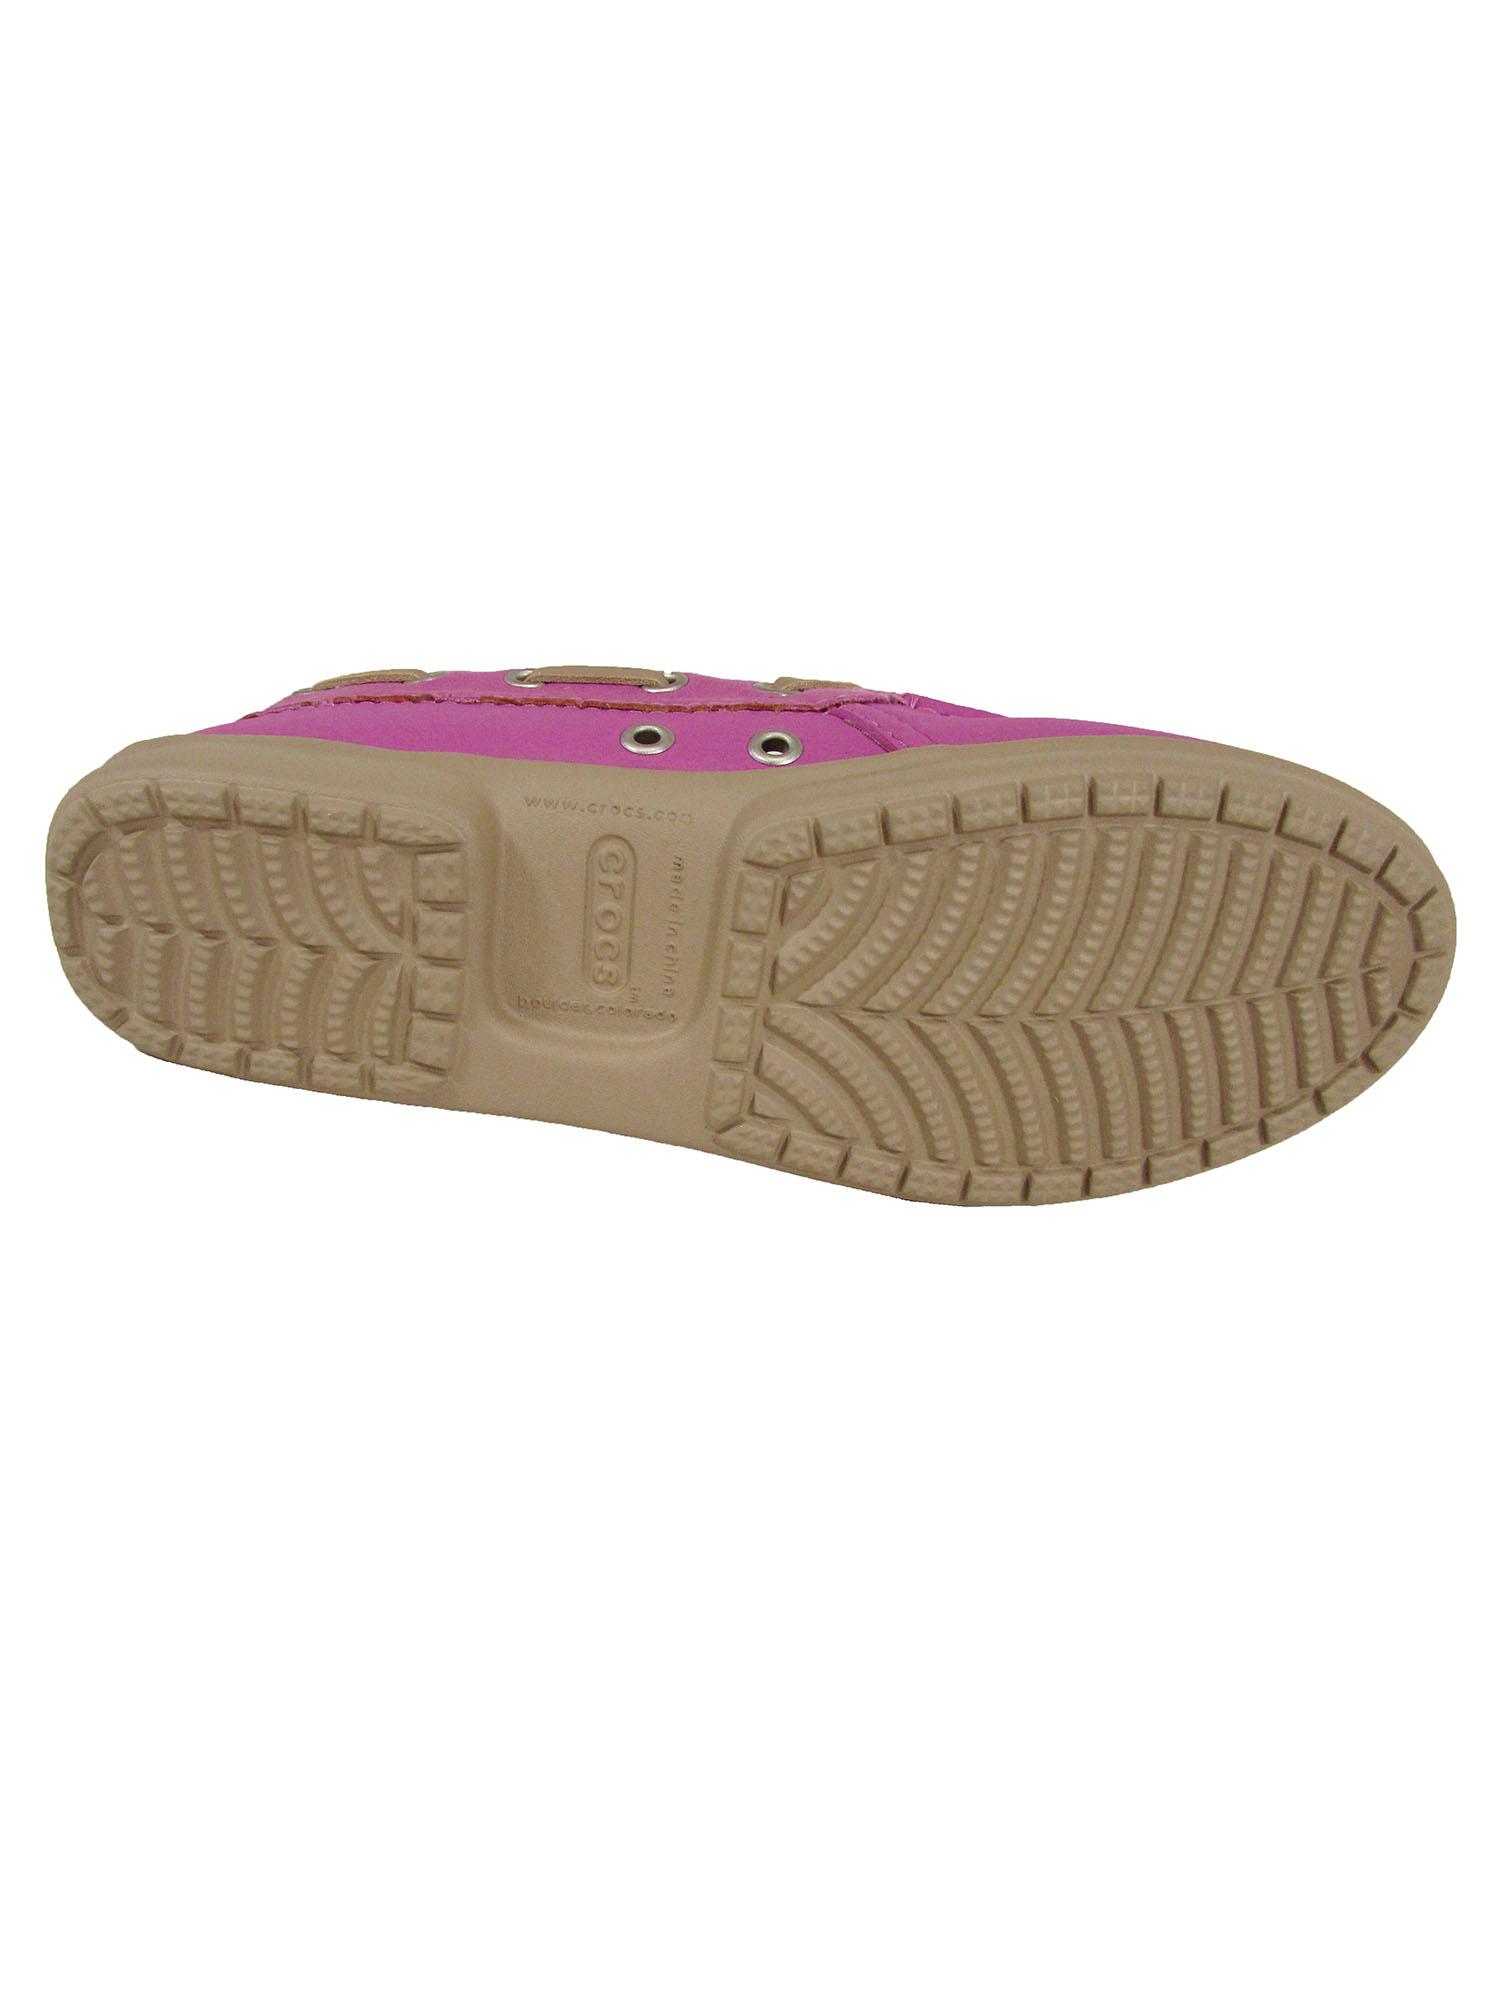 Crocs-Womens-Wrap-ColorLite-Loafer-Shoes thumbnail 21